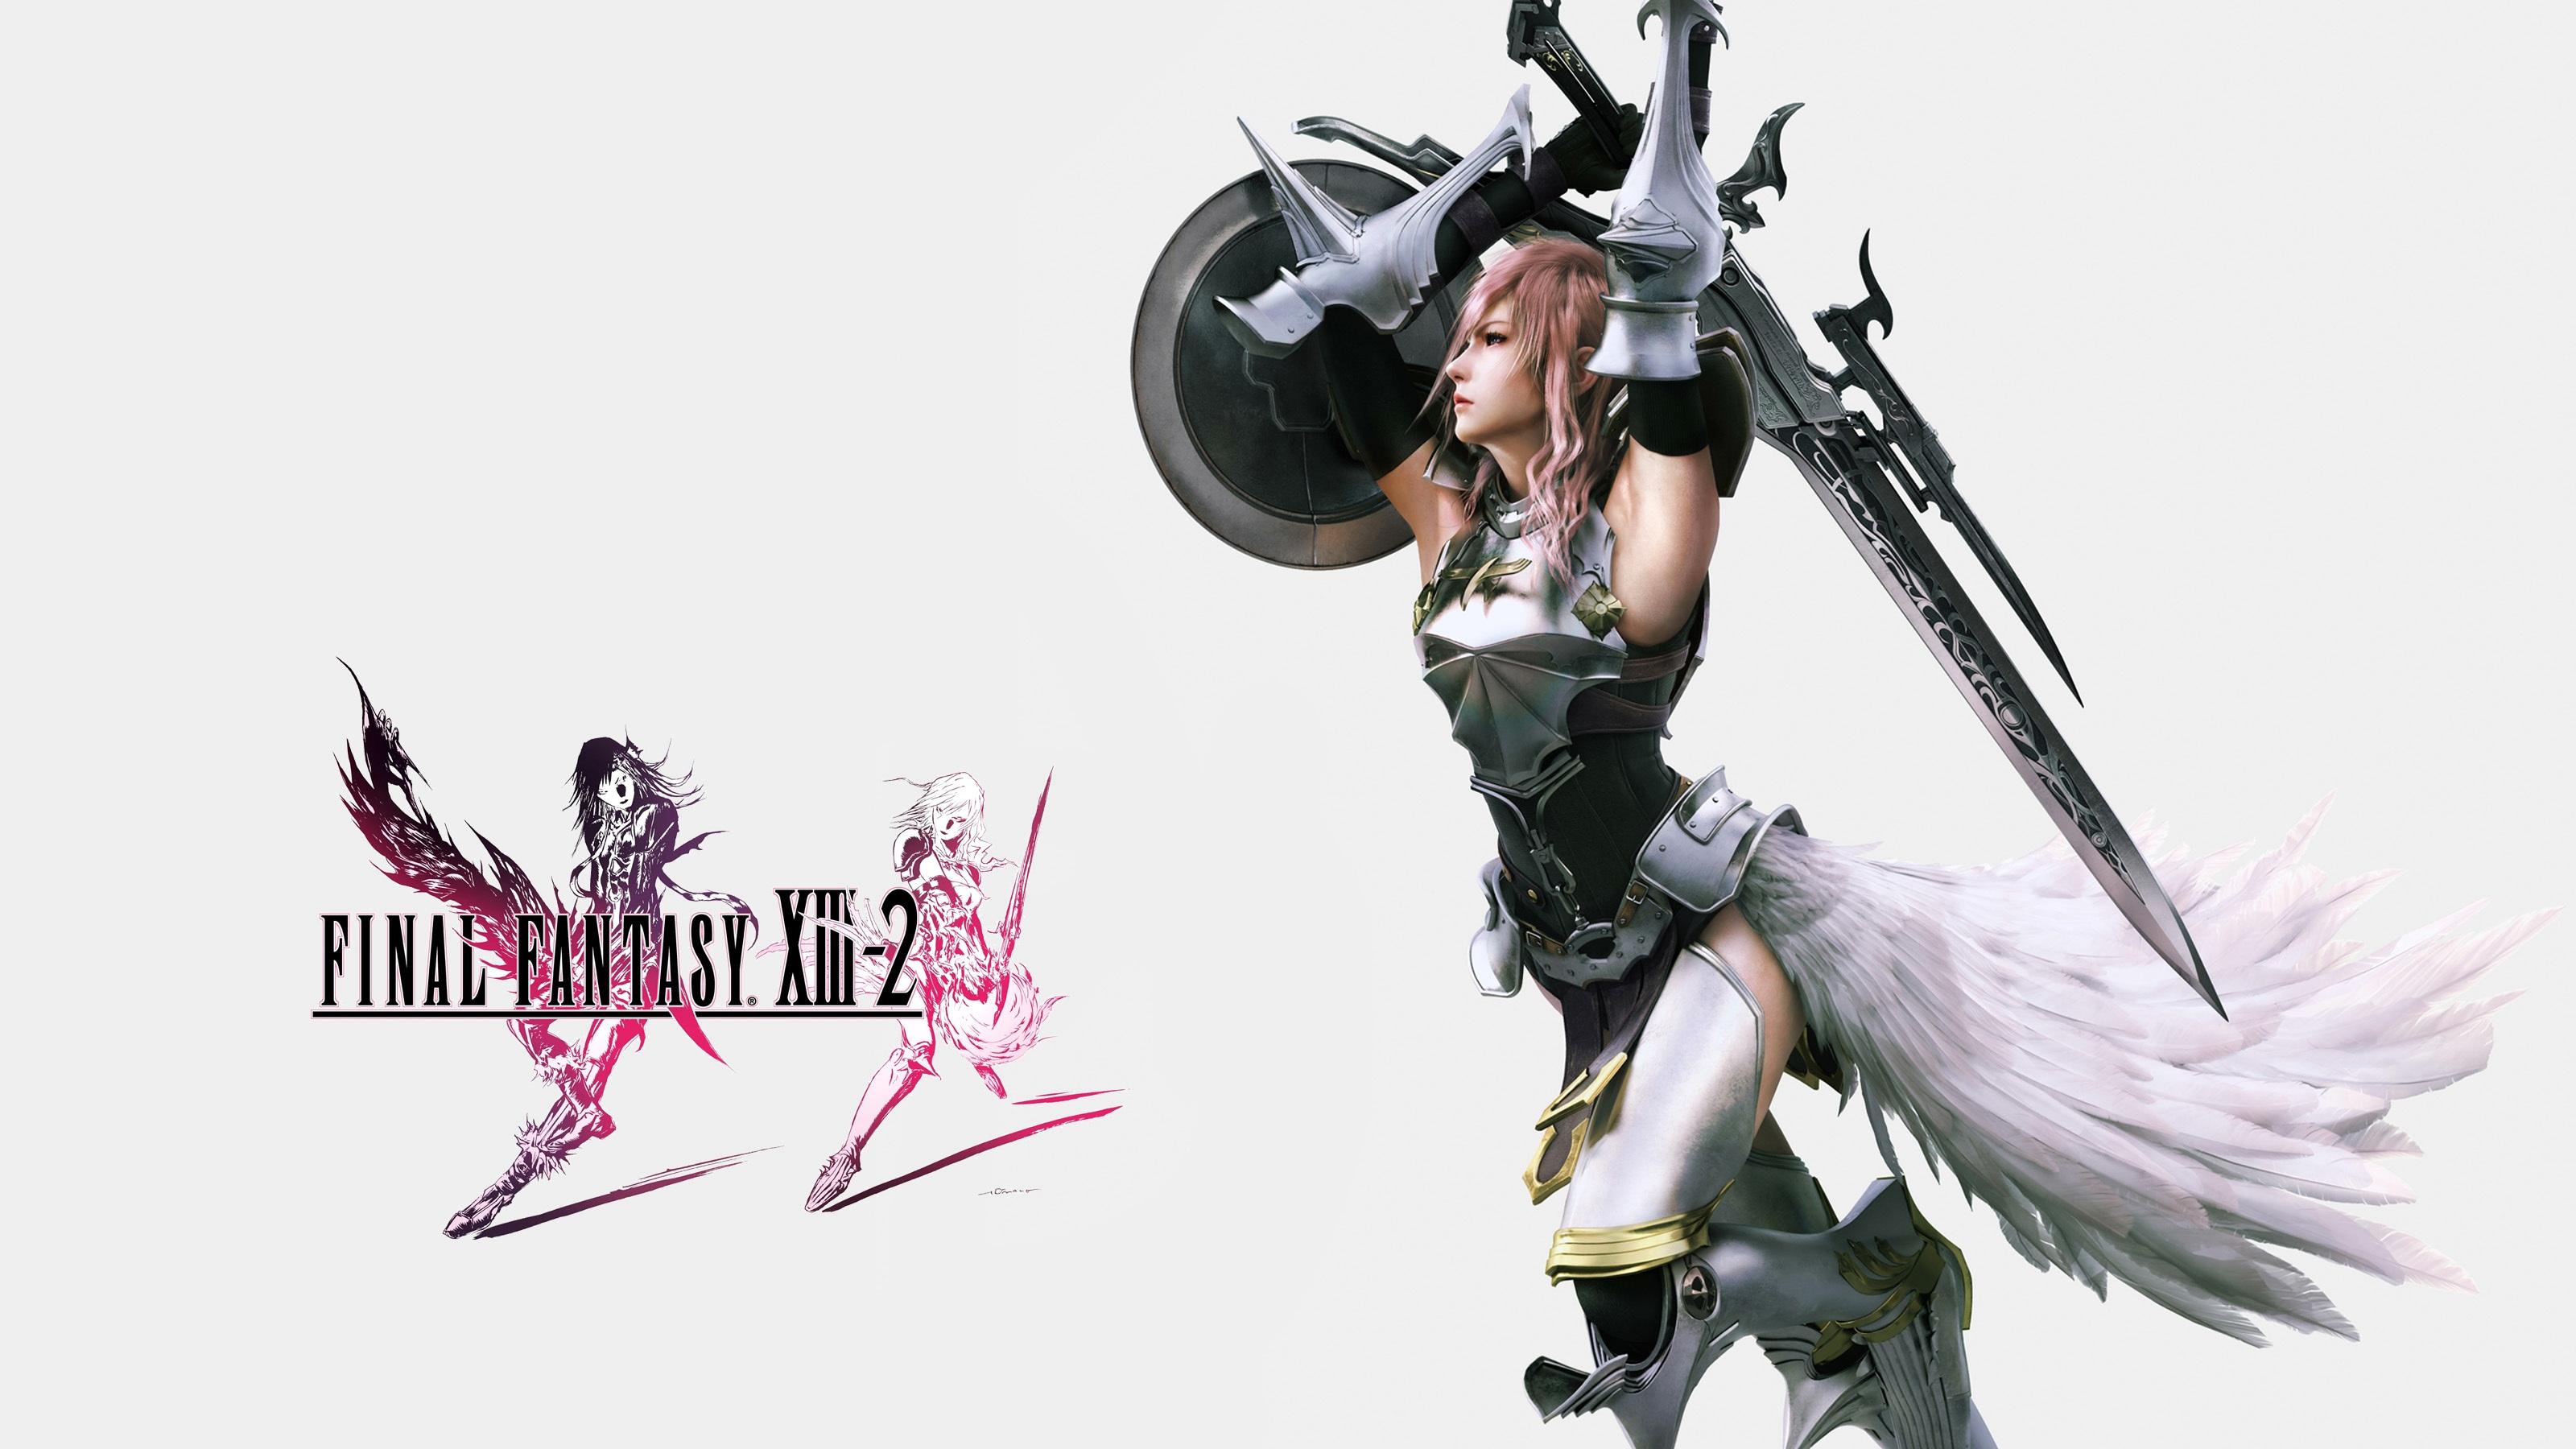 Free Download Final Fantasy Xiii 2 Lightning Wallpapers Hd